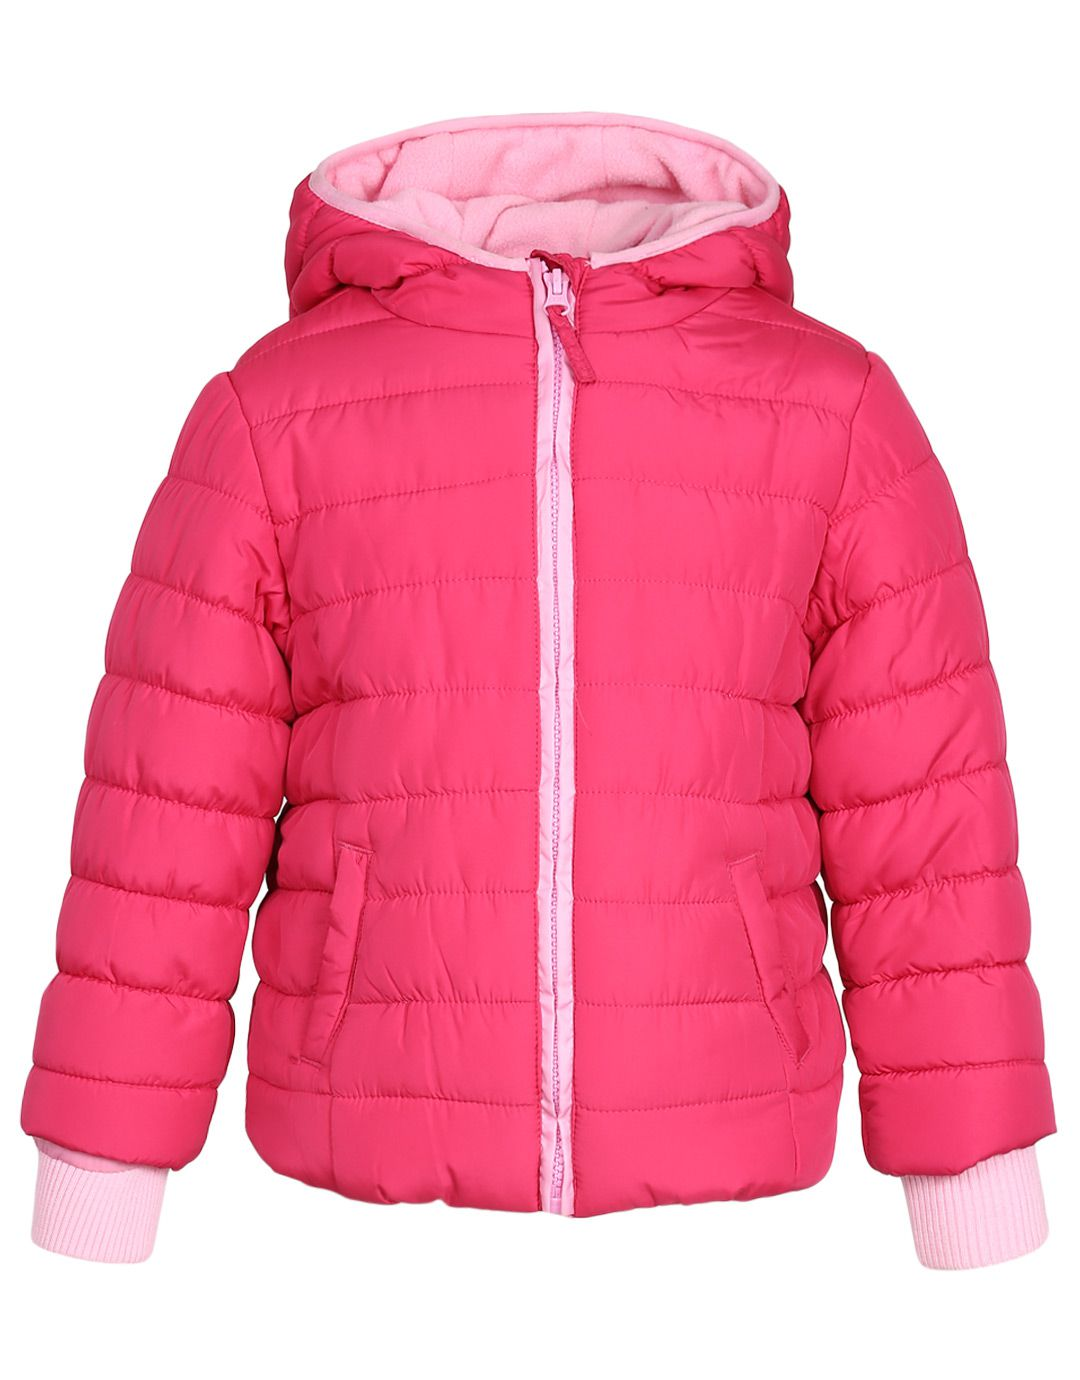 Mothercare Girls Pink Jacket